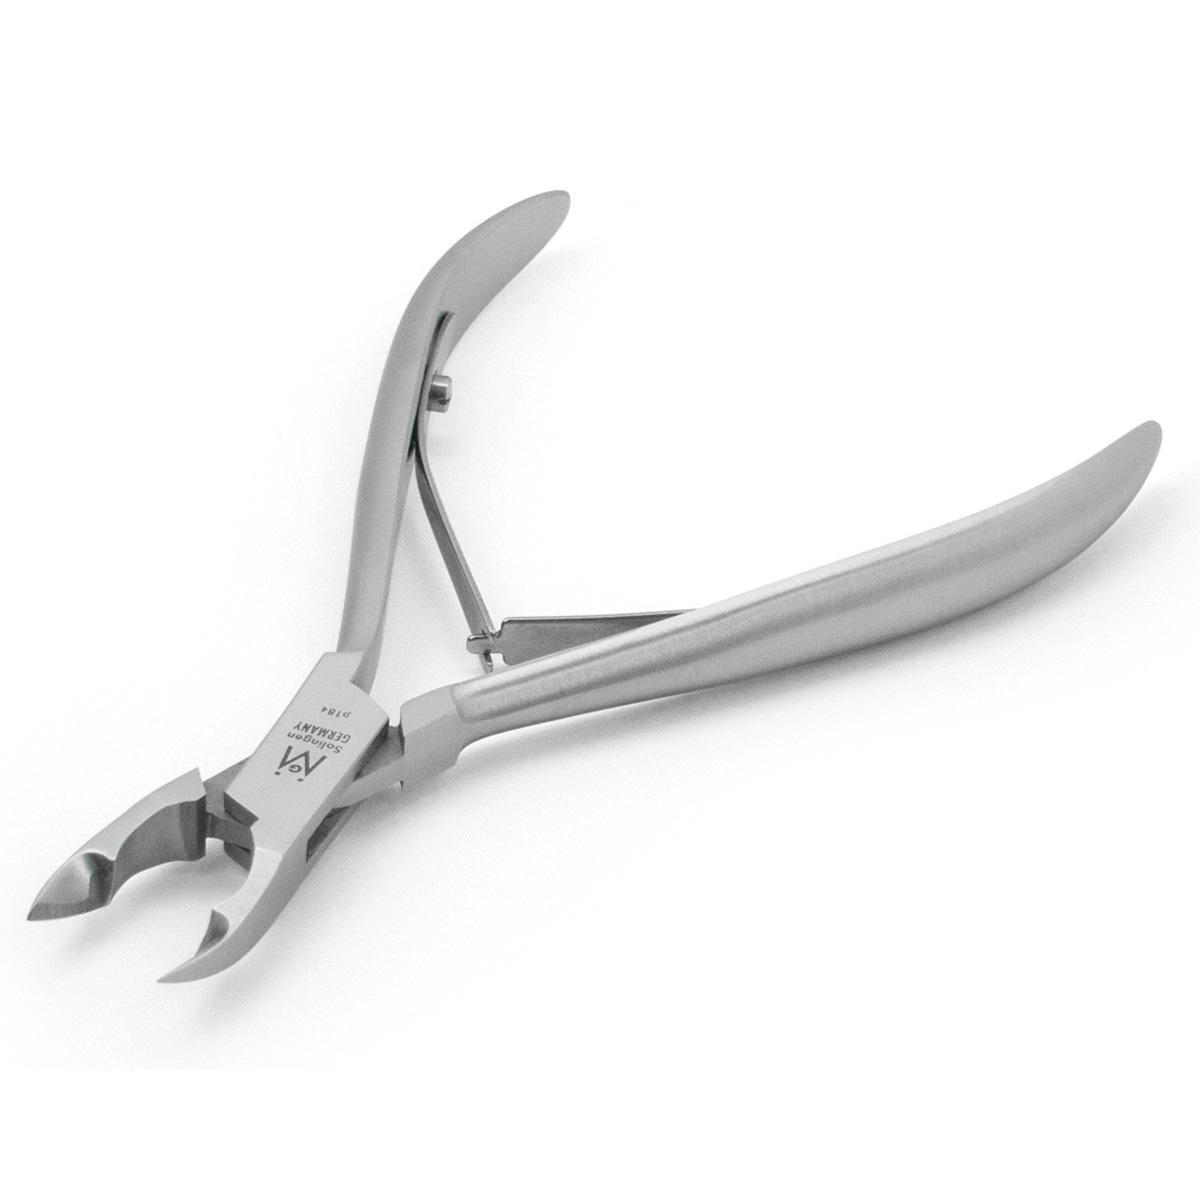 Convex ingrown toenail nipper